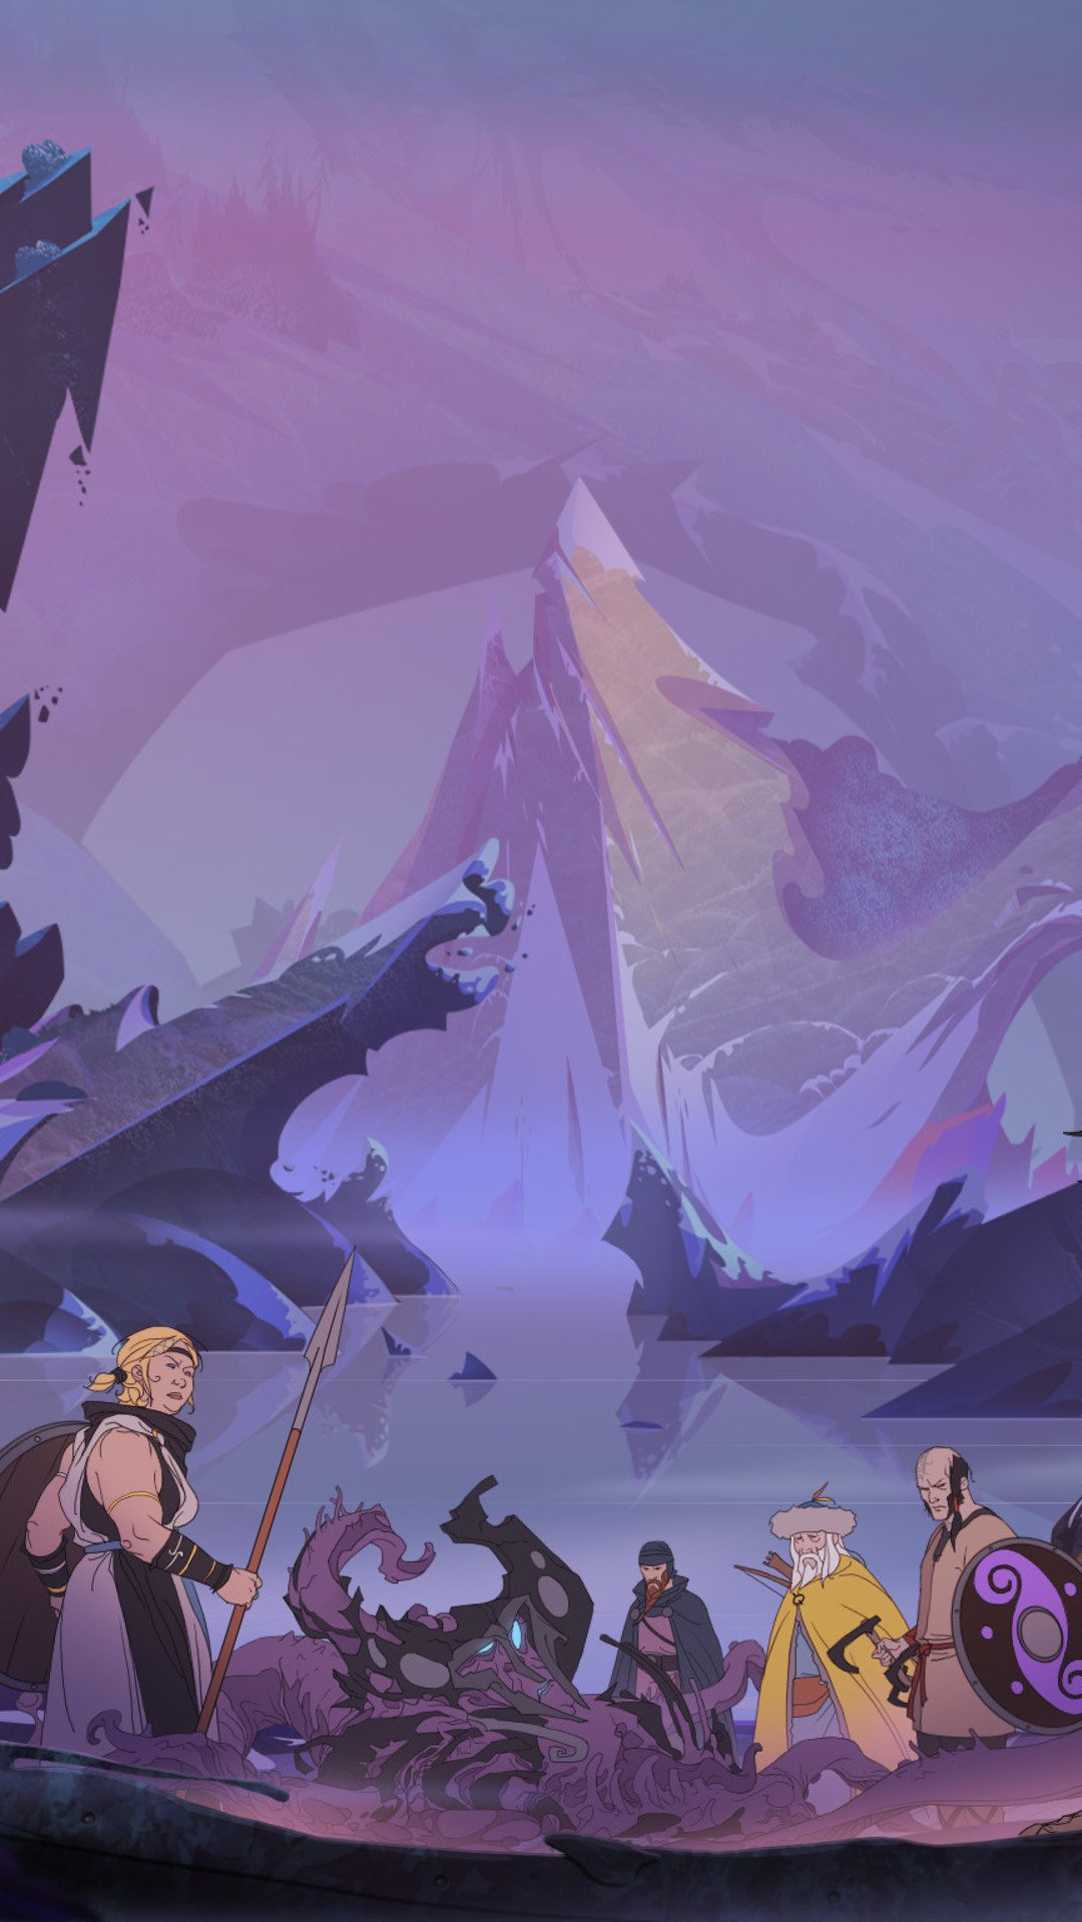 Banner Anime 4k Wallpapers - Wallpaper Cave